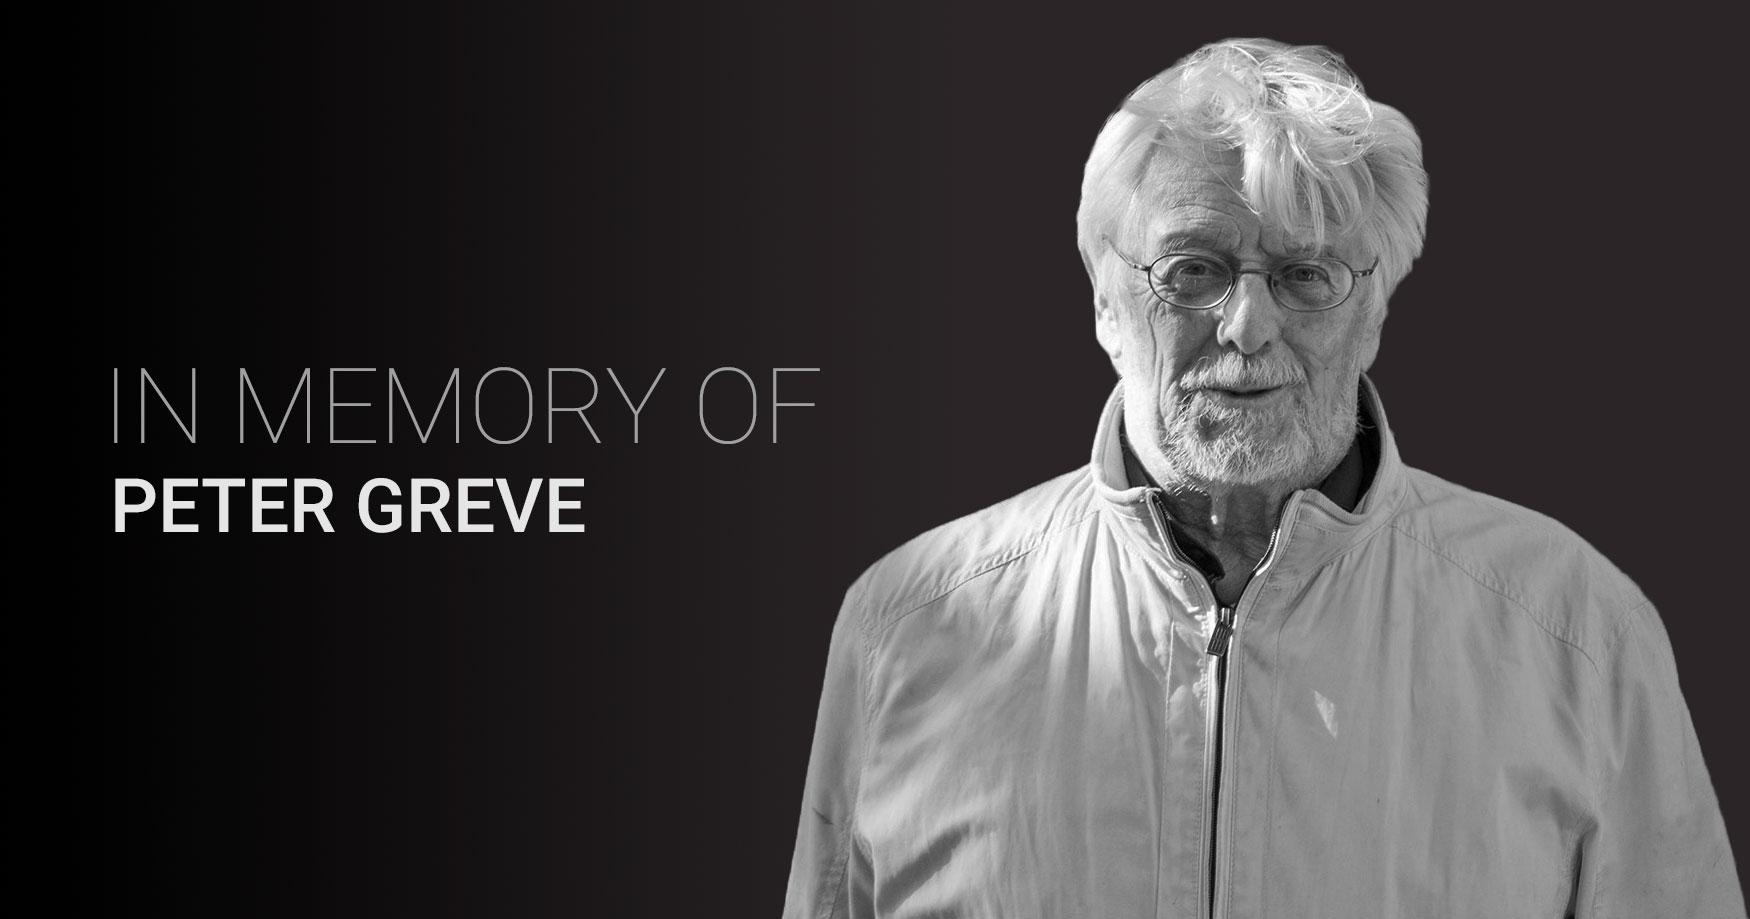 We Remember Peter Greve